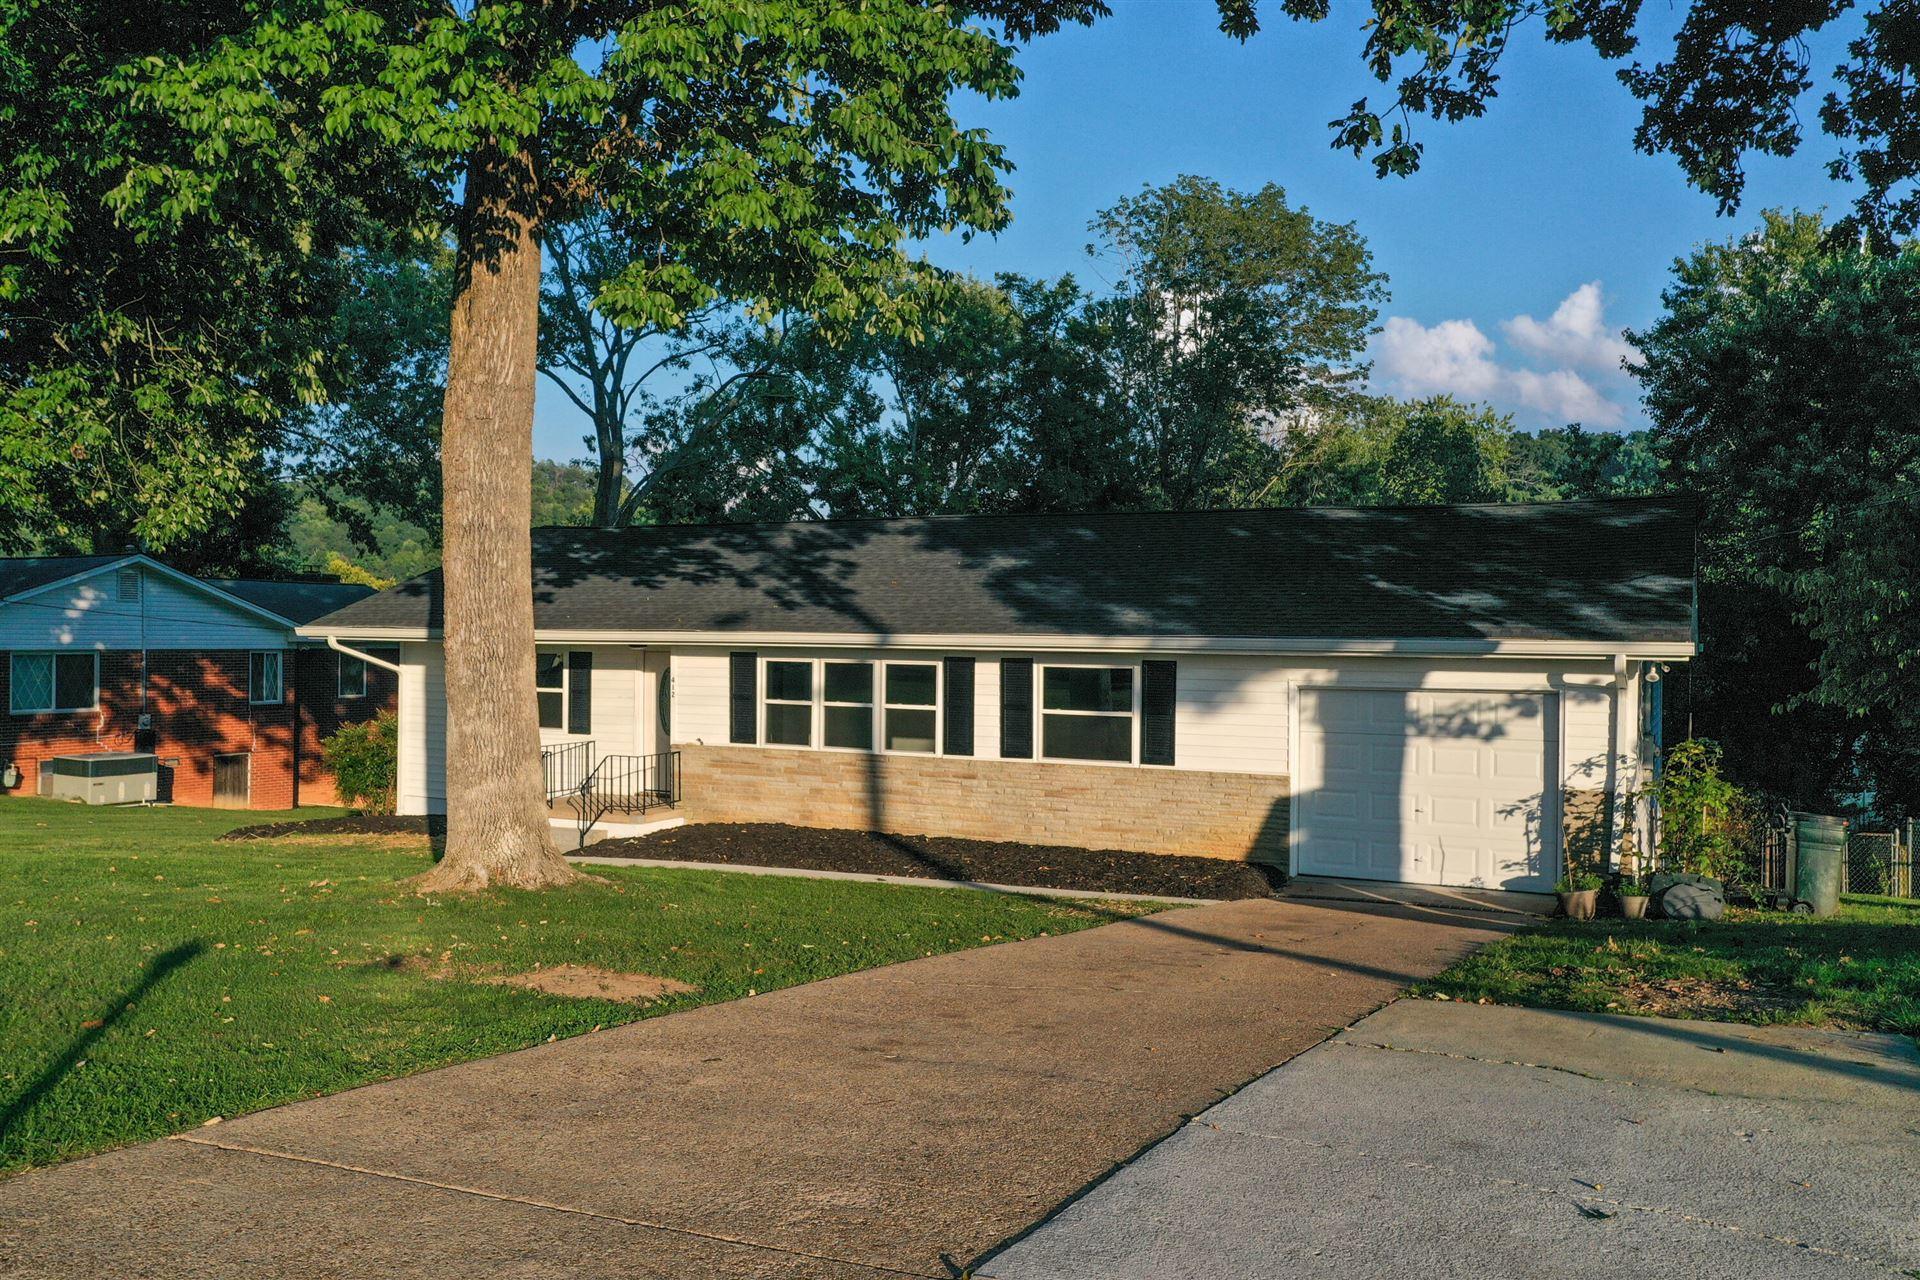 Photo of 412 Woodland Drive, Clinton, TN 37716 (MLS # 1166825)